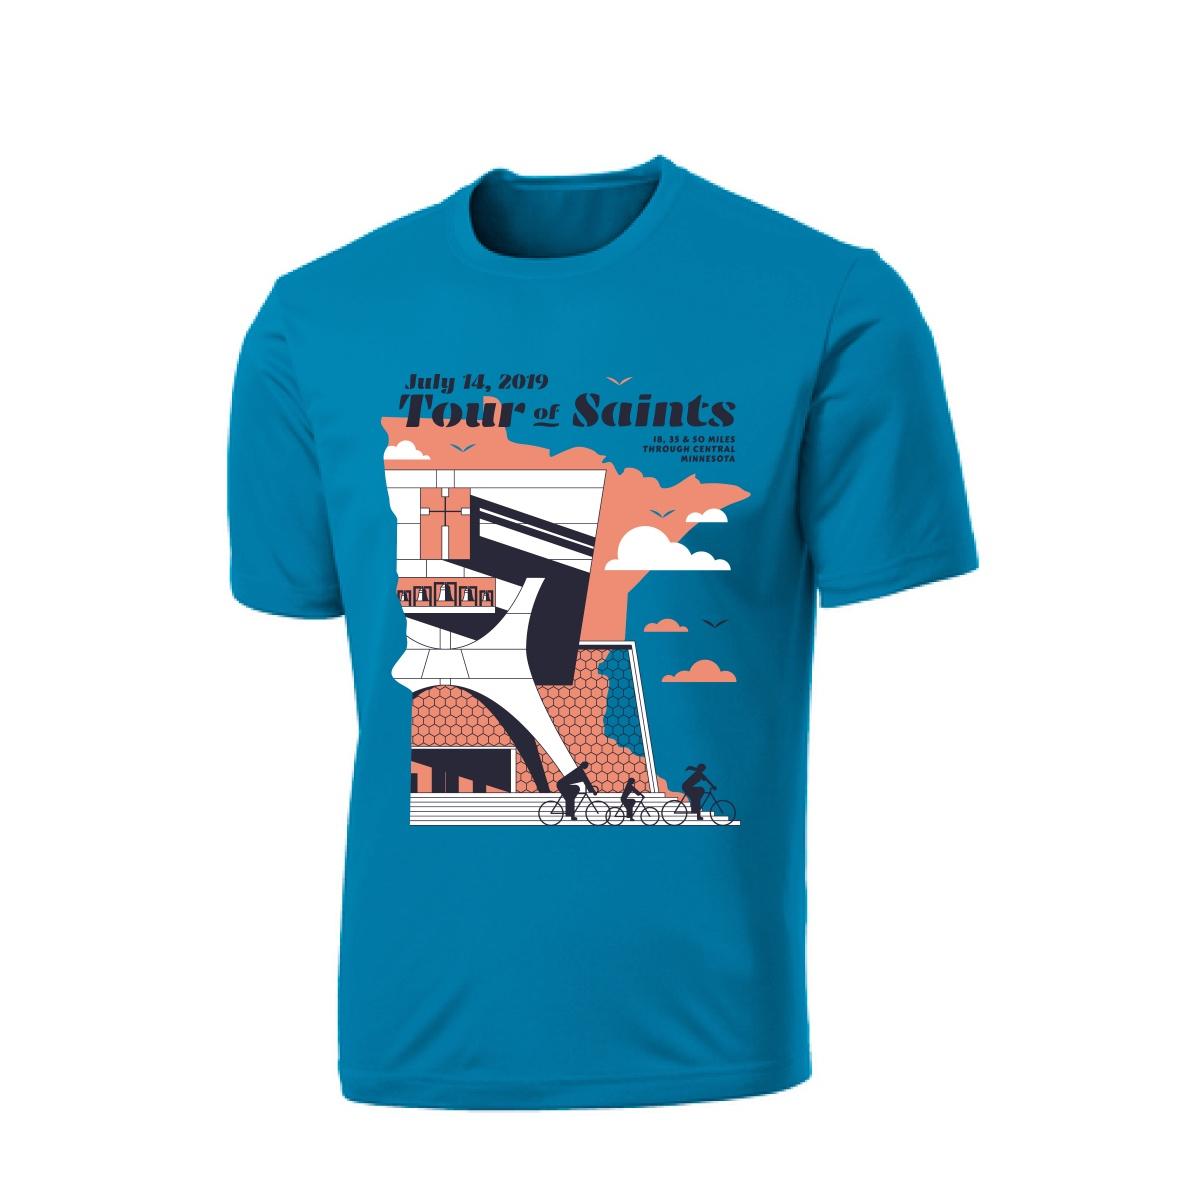 A mockup of the 2019 Tour of Saints signature t-shirt.